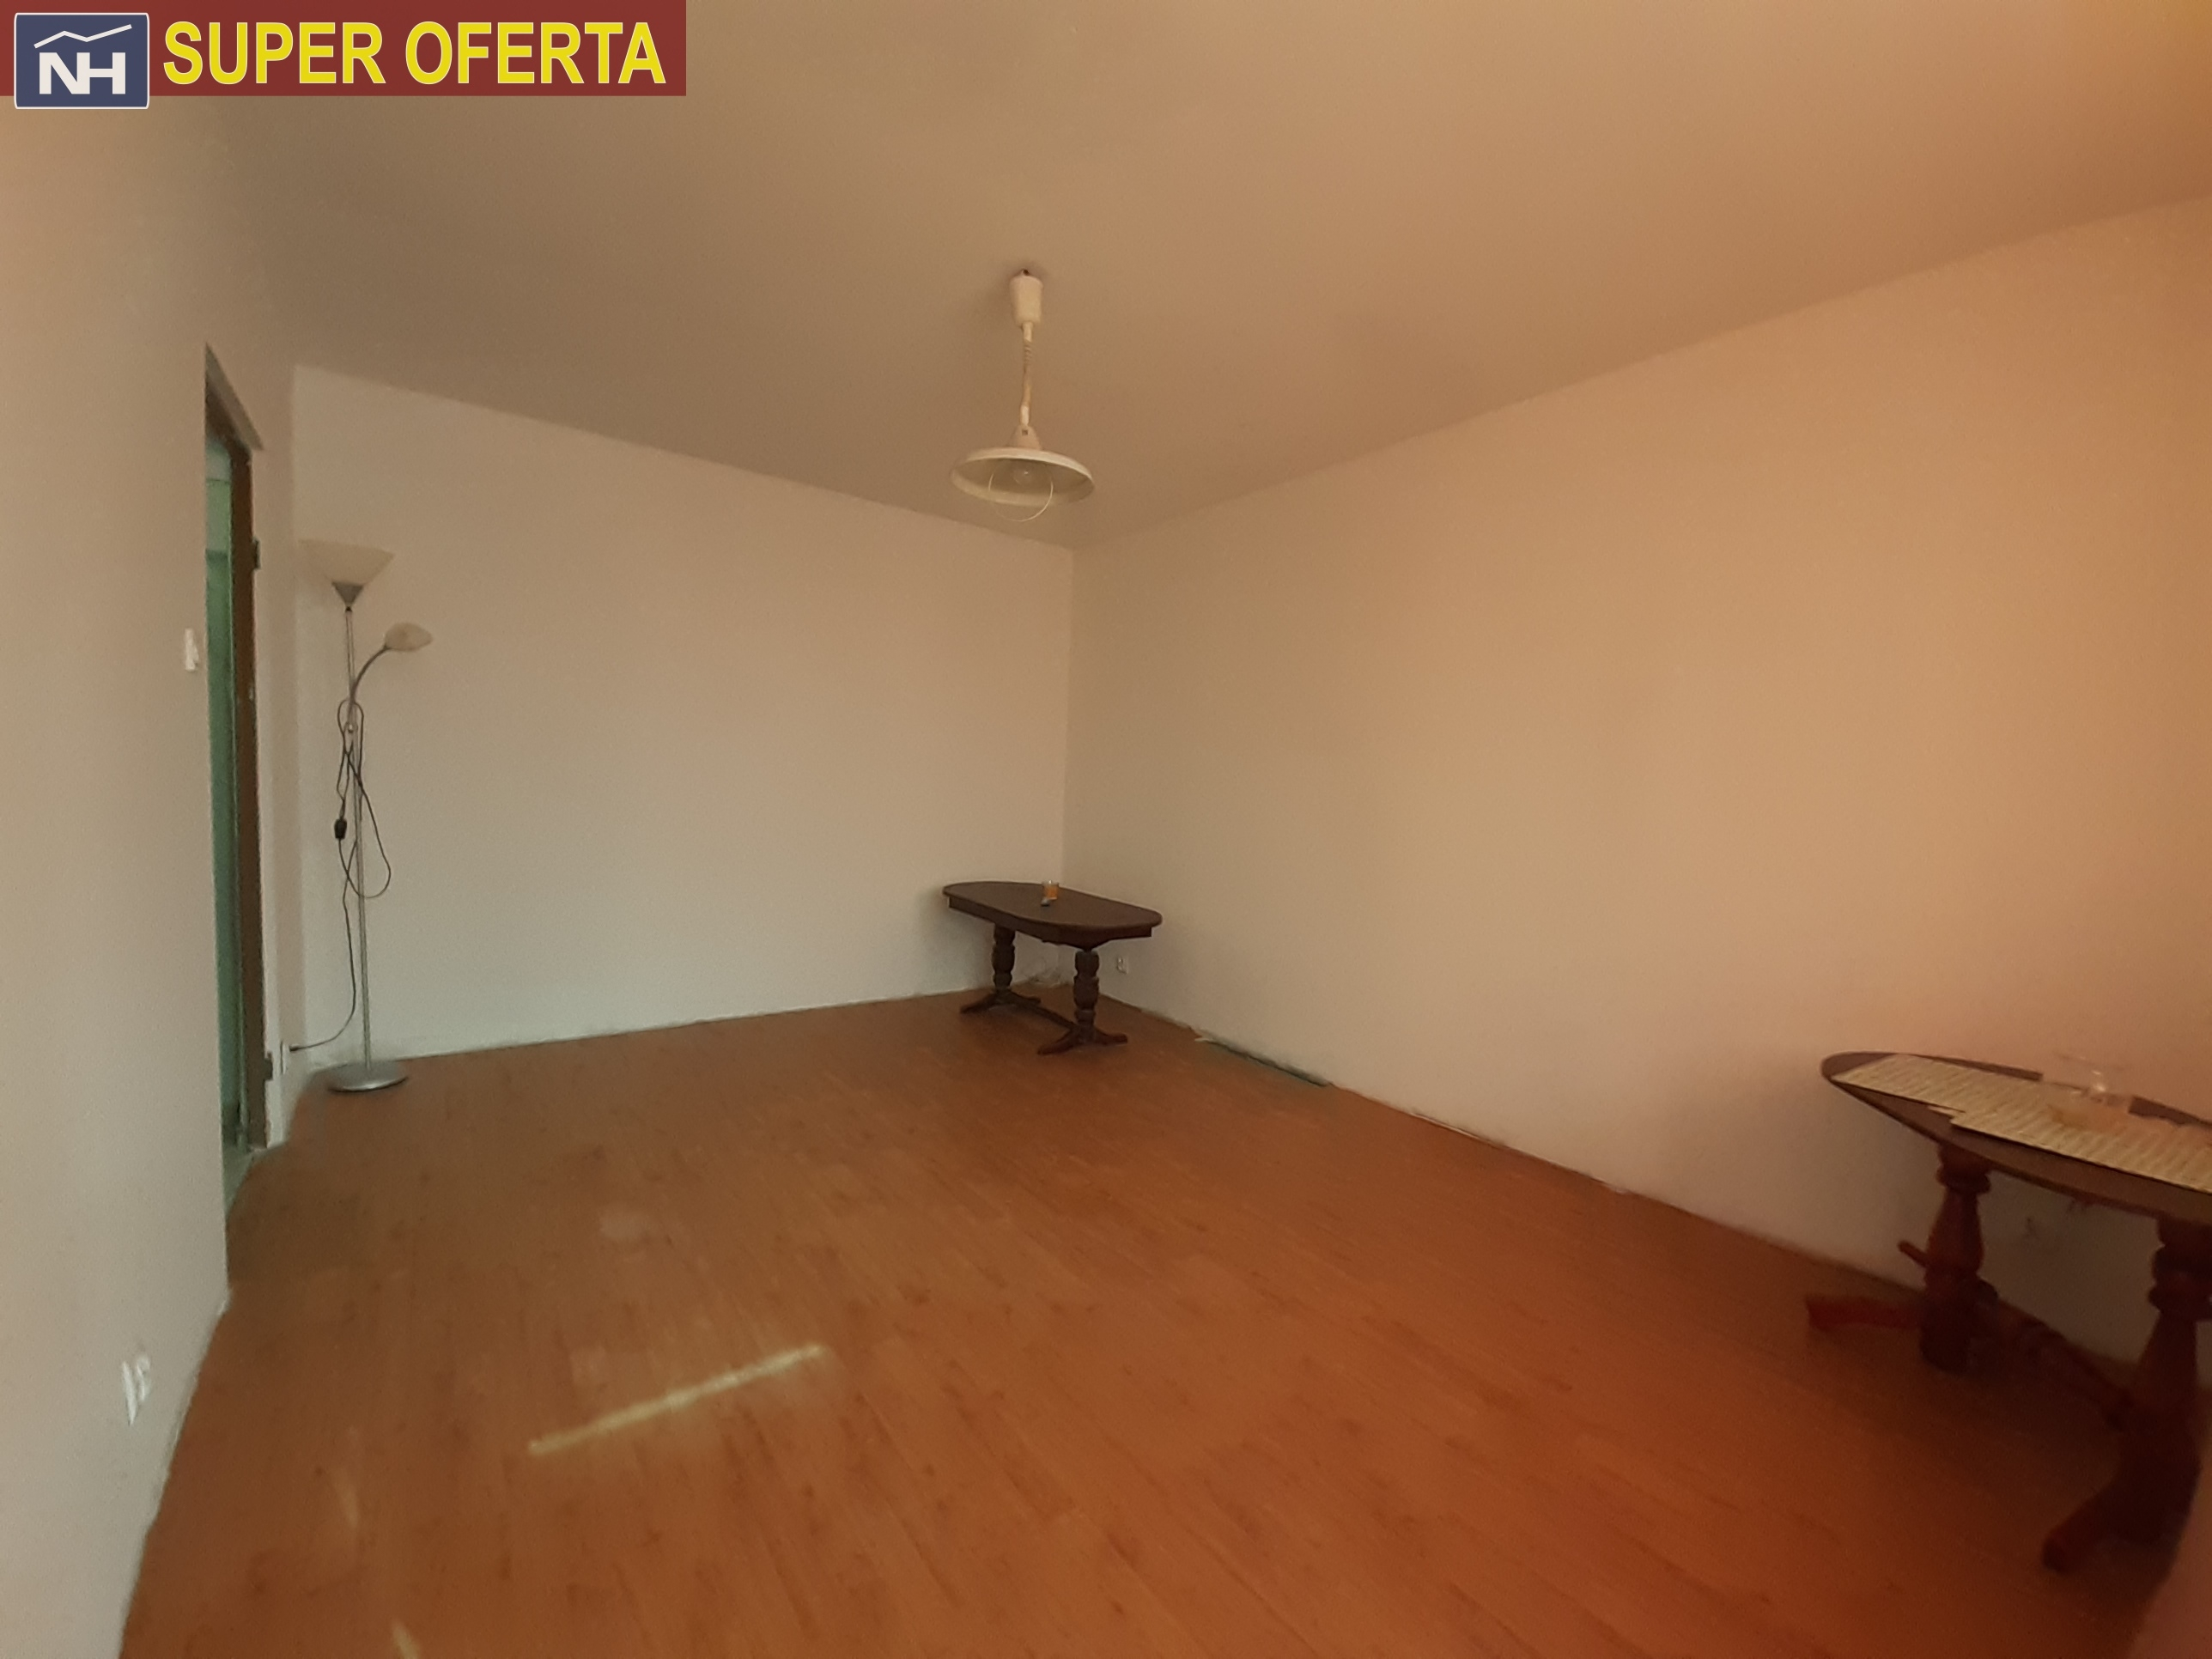 Mieszkanie 2 pokoje 46,6 m2 Kapuściska